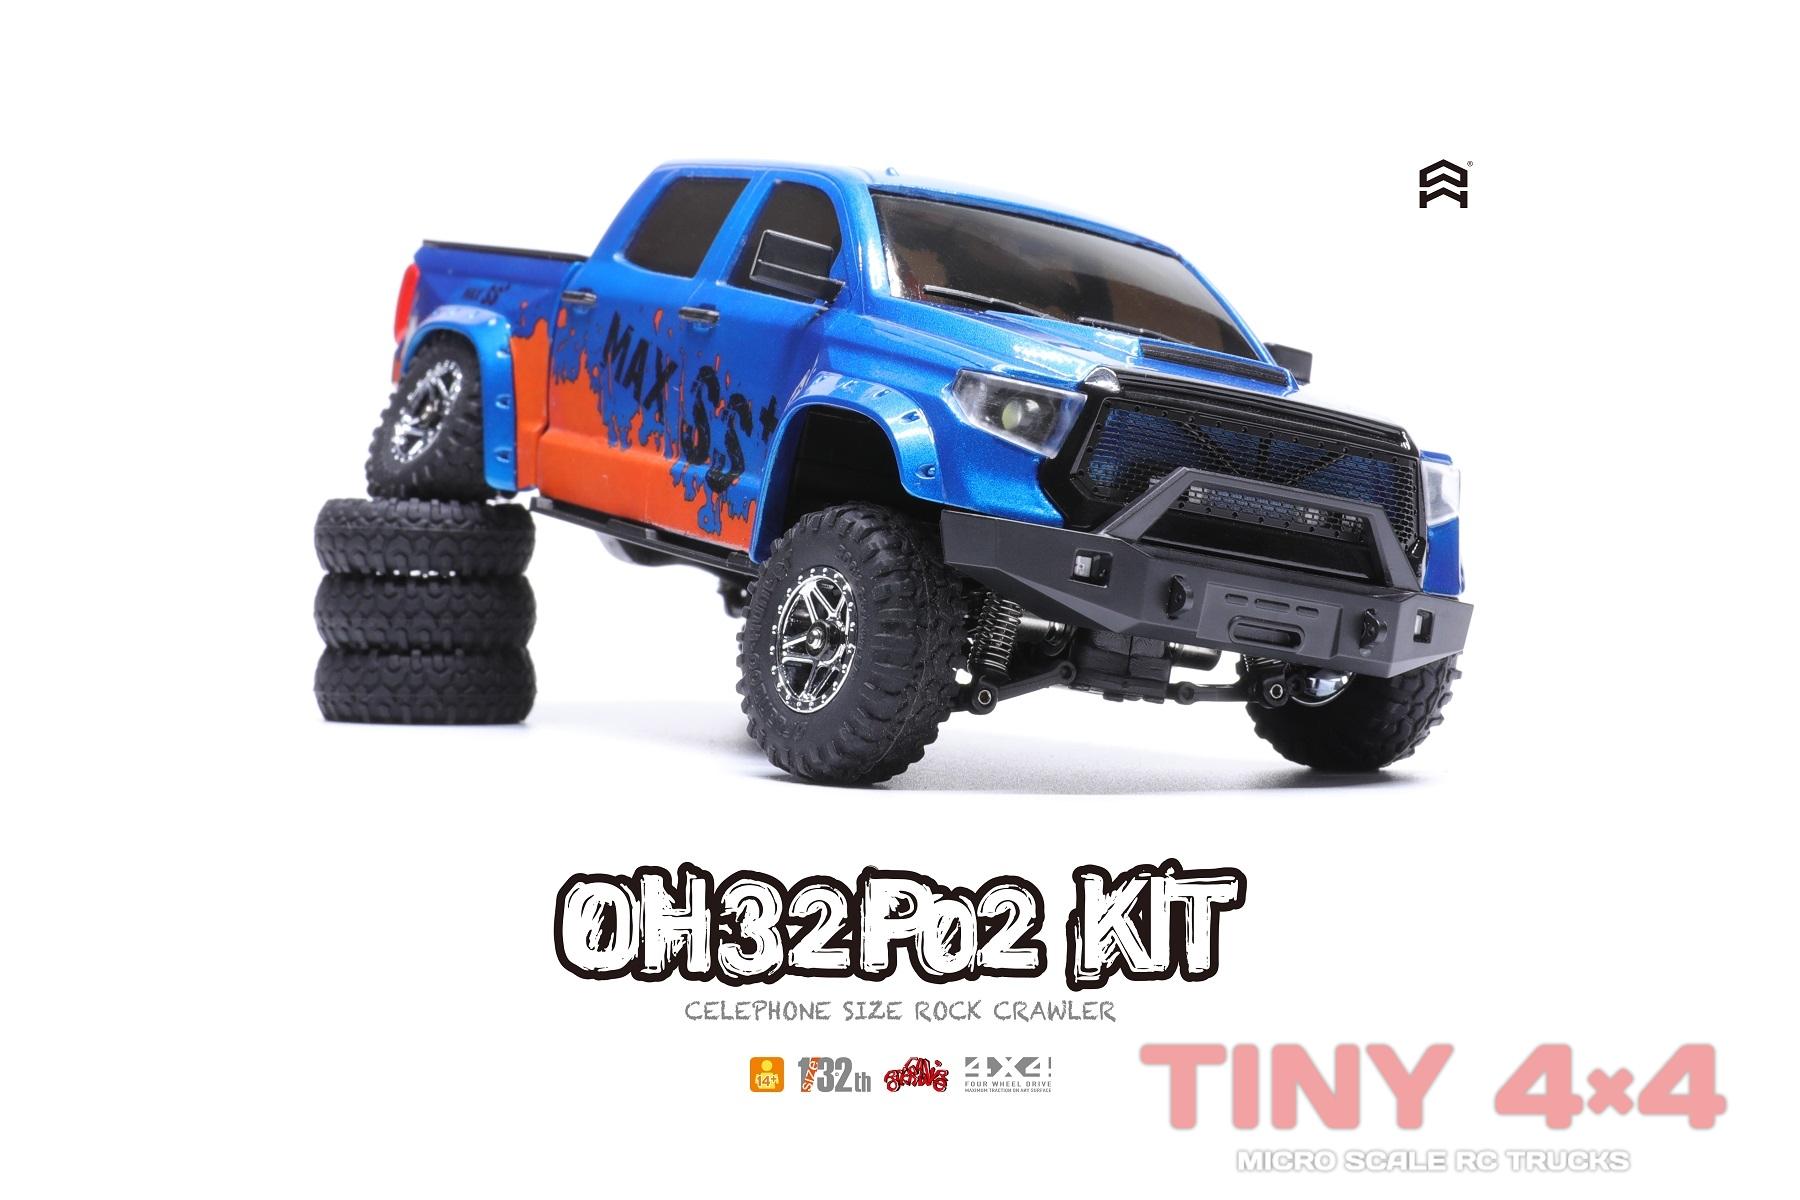 Orlandoo Hunter Appearance Kit